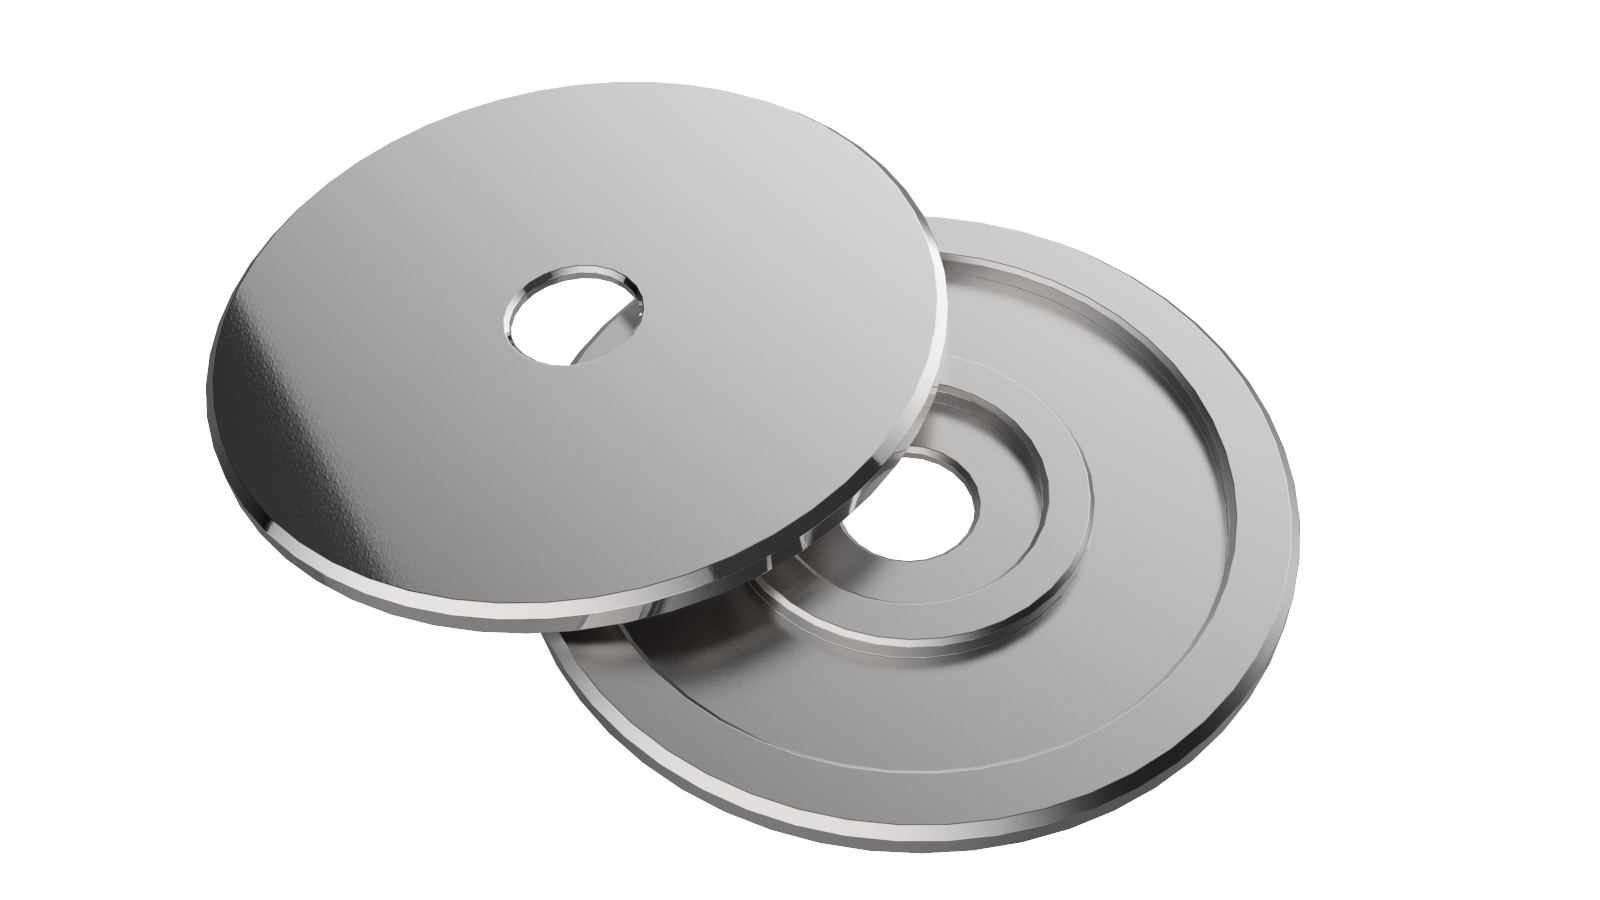 PICO 155 75 mm diameter flanges